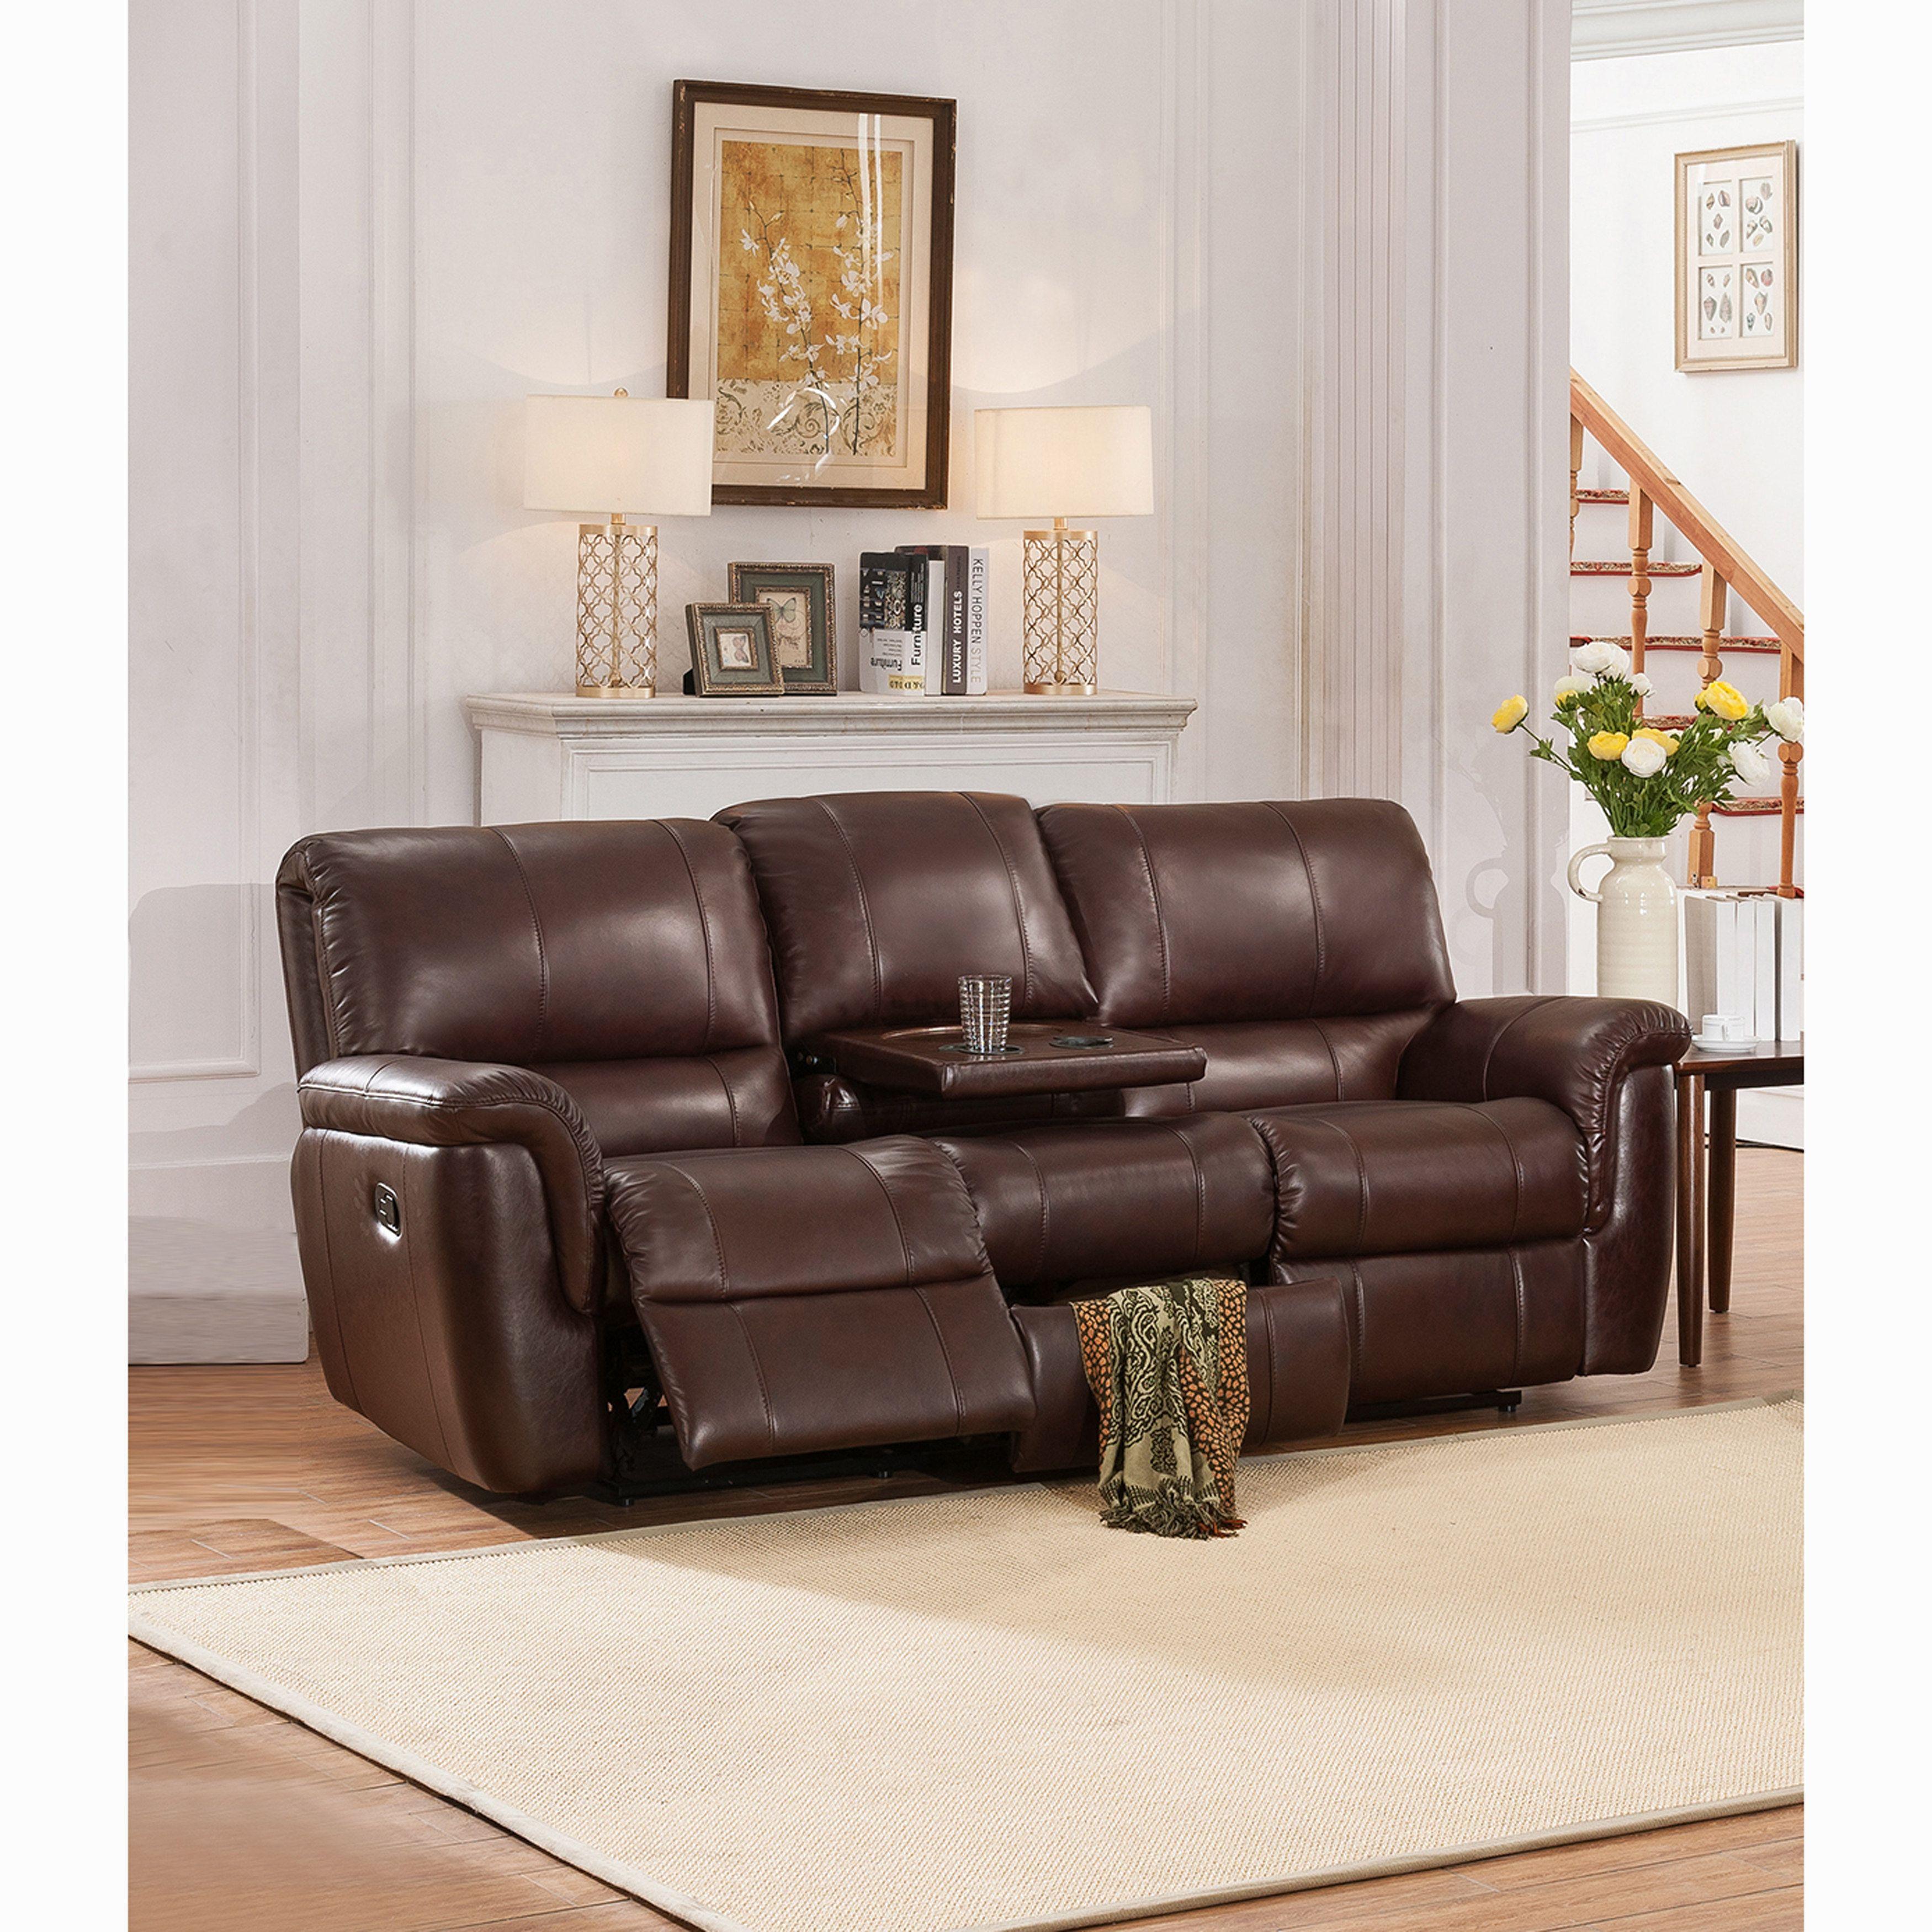 Ethan Chestnut Brown Premium Top Grain Leather Reclining Sofa Leather Reclining Sofa Sofa Furniture Reclining Sofa